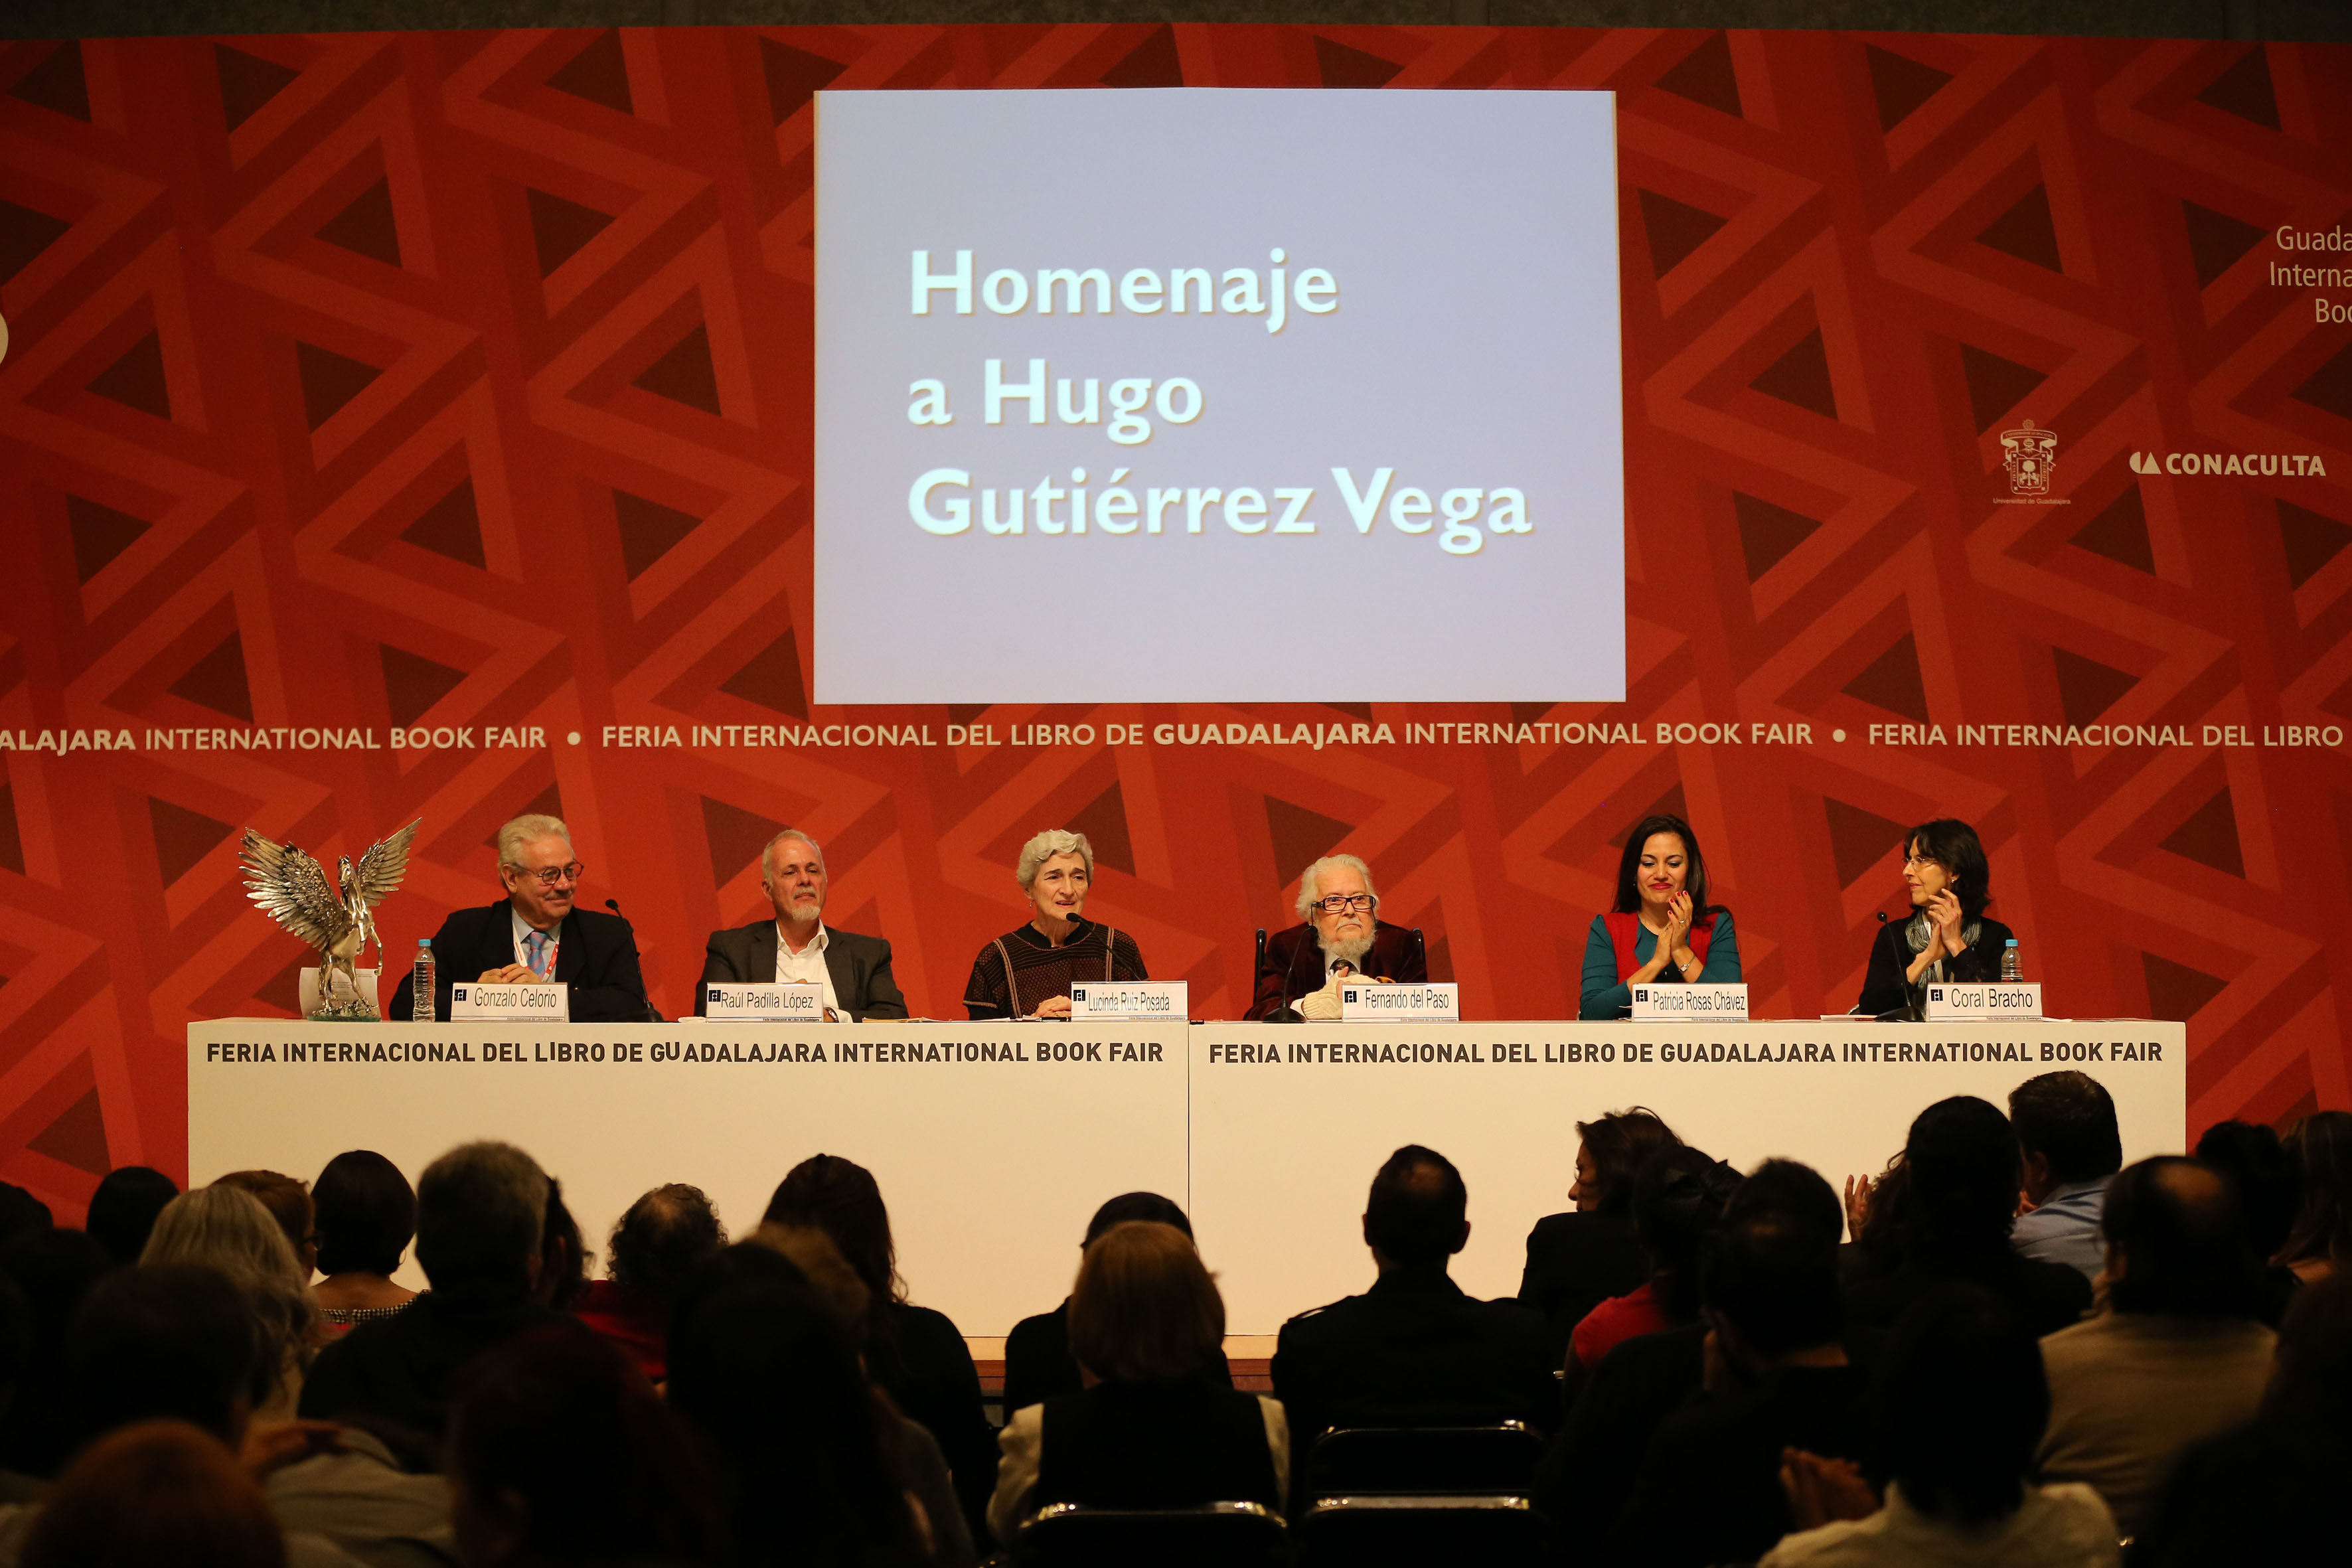 Participantes al homenaje.póstumo a Hugo Gutierrez de la Vega en la FIL de Guadalajara